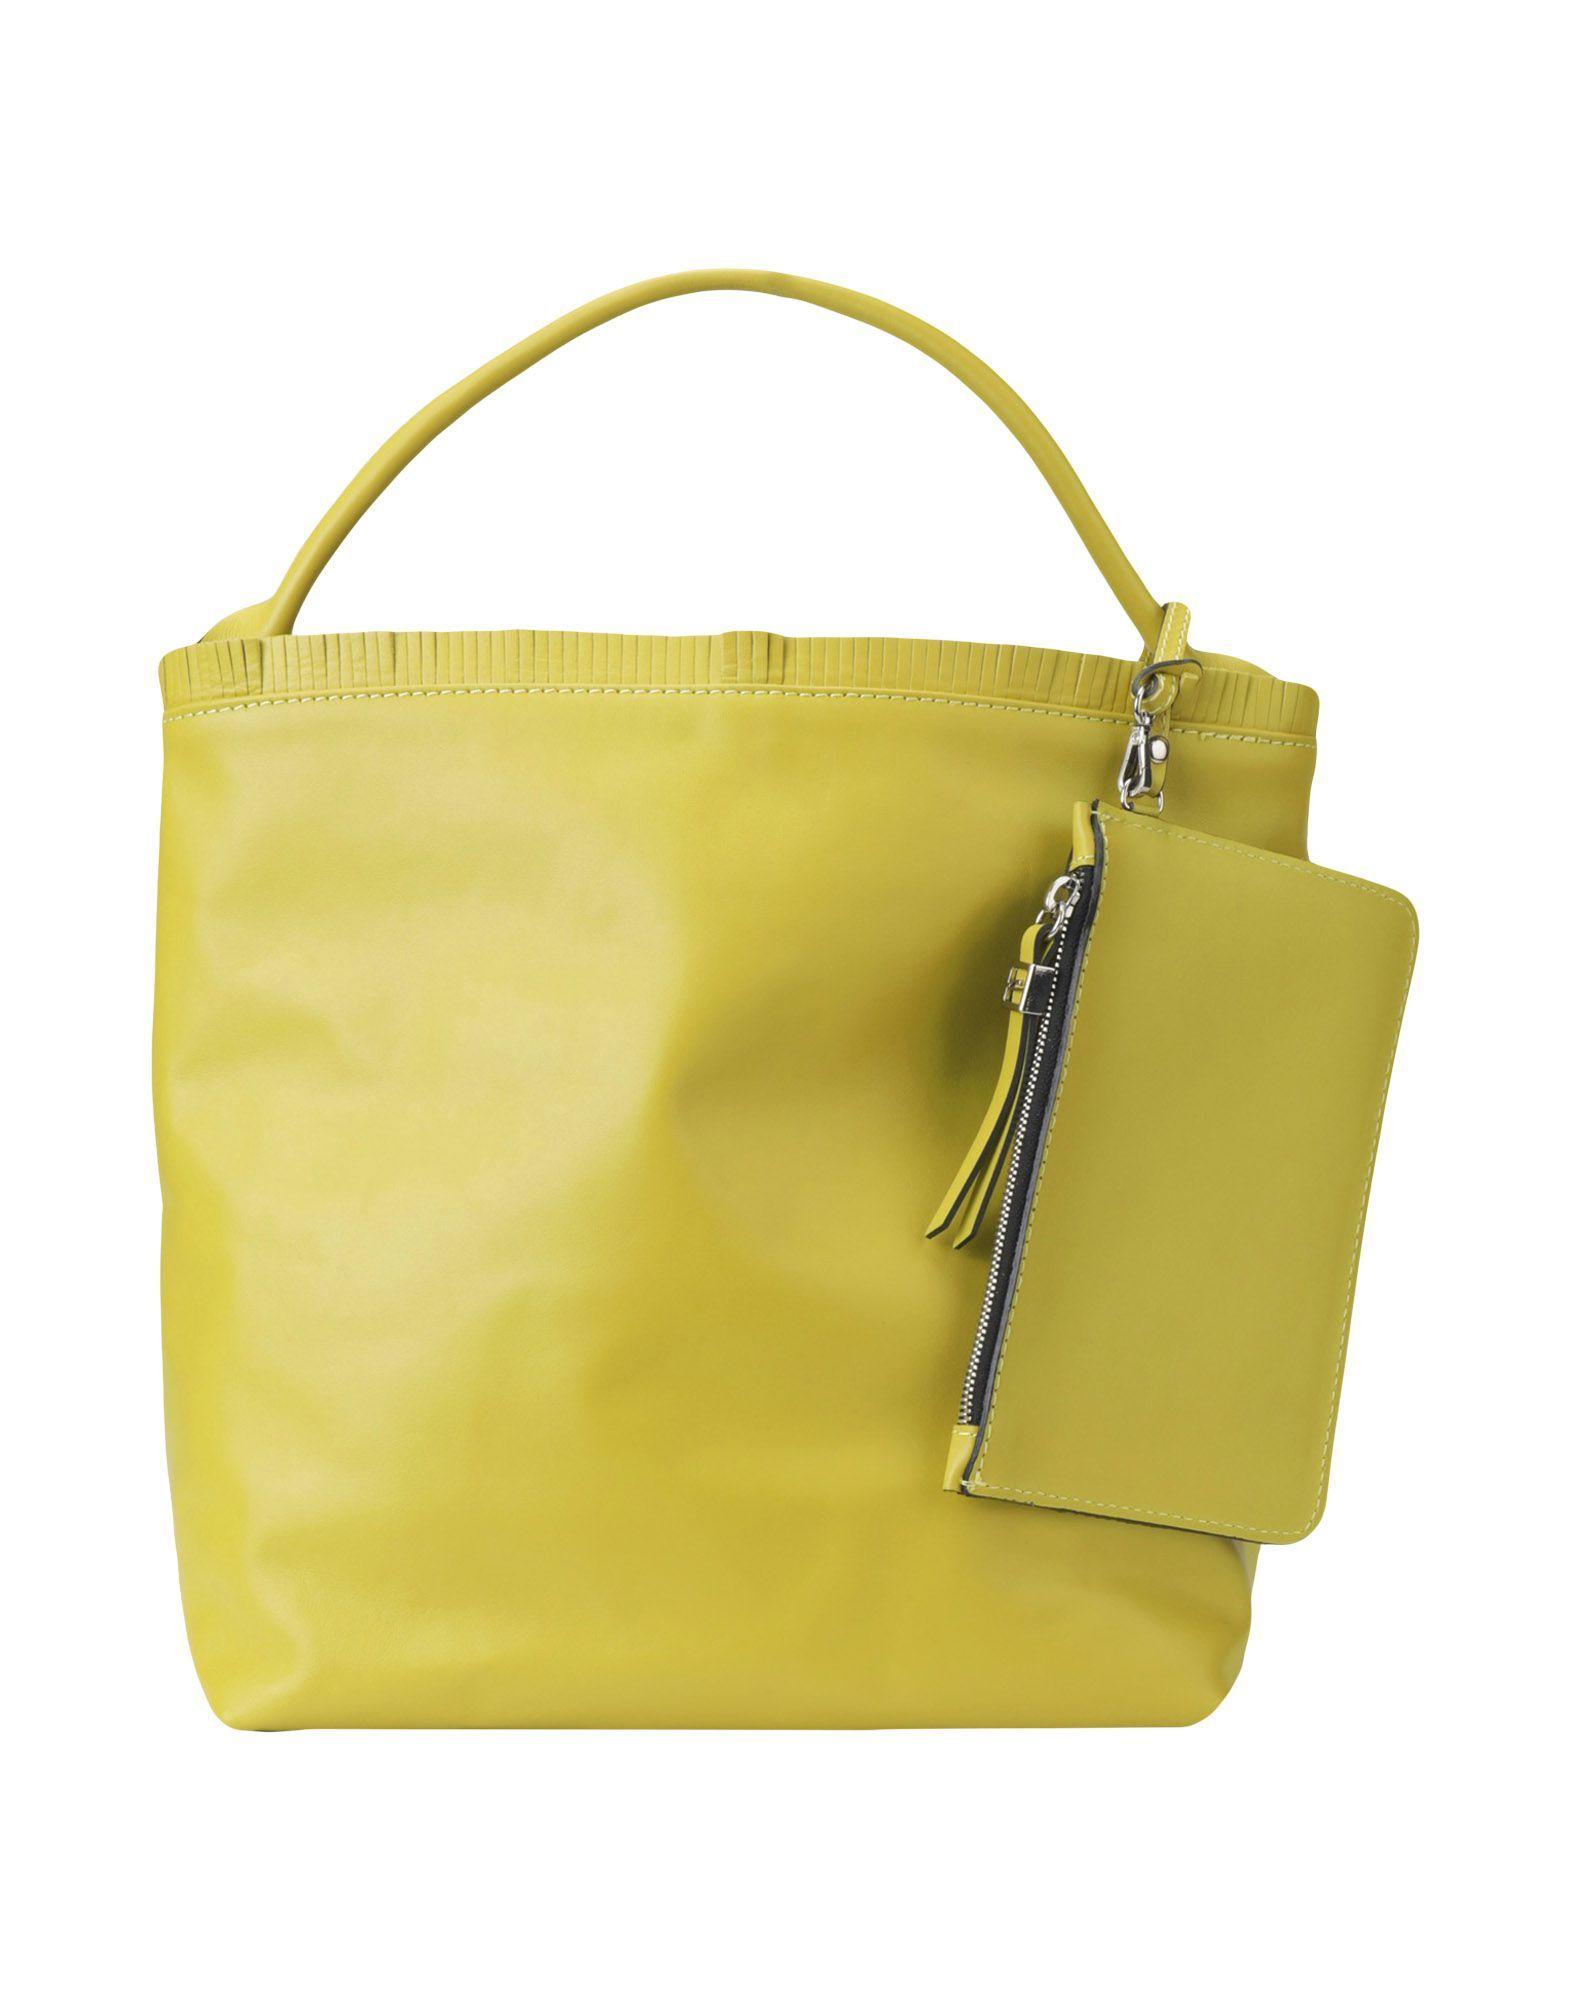 143c16e4dd4 GIANNI CHIARINI . #giannichiarini #bags #leather #hand bags ...